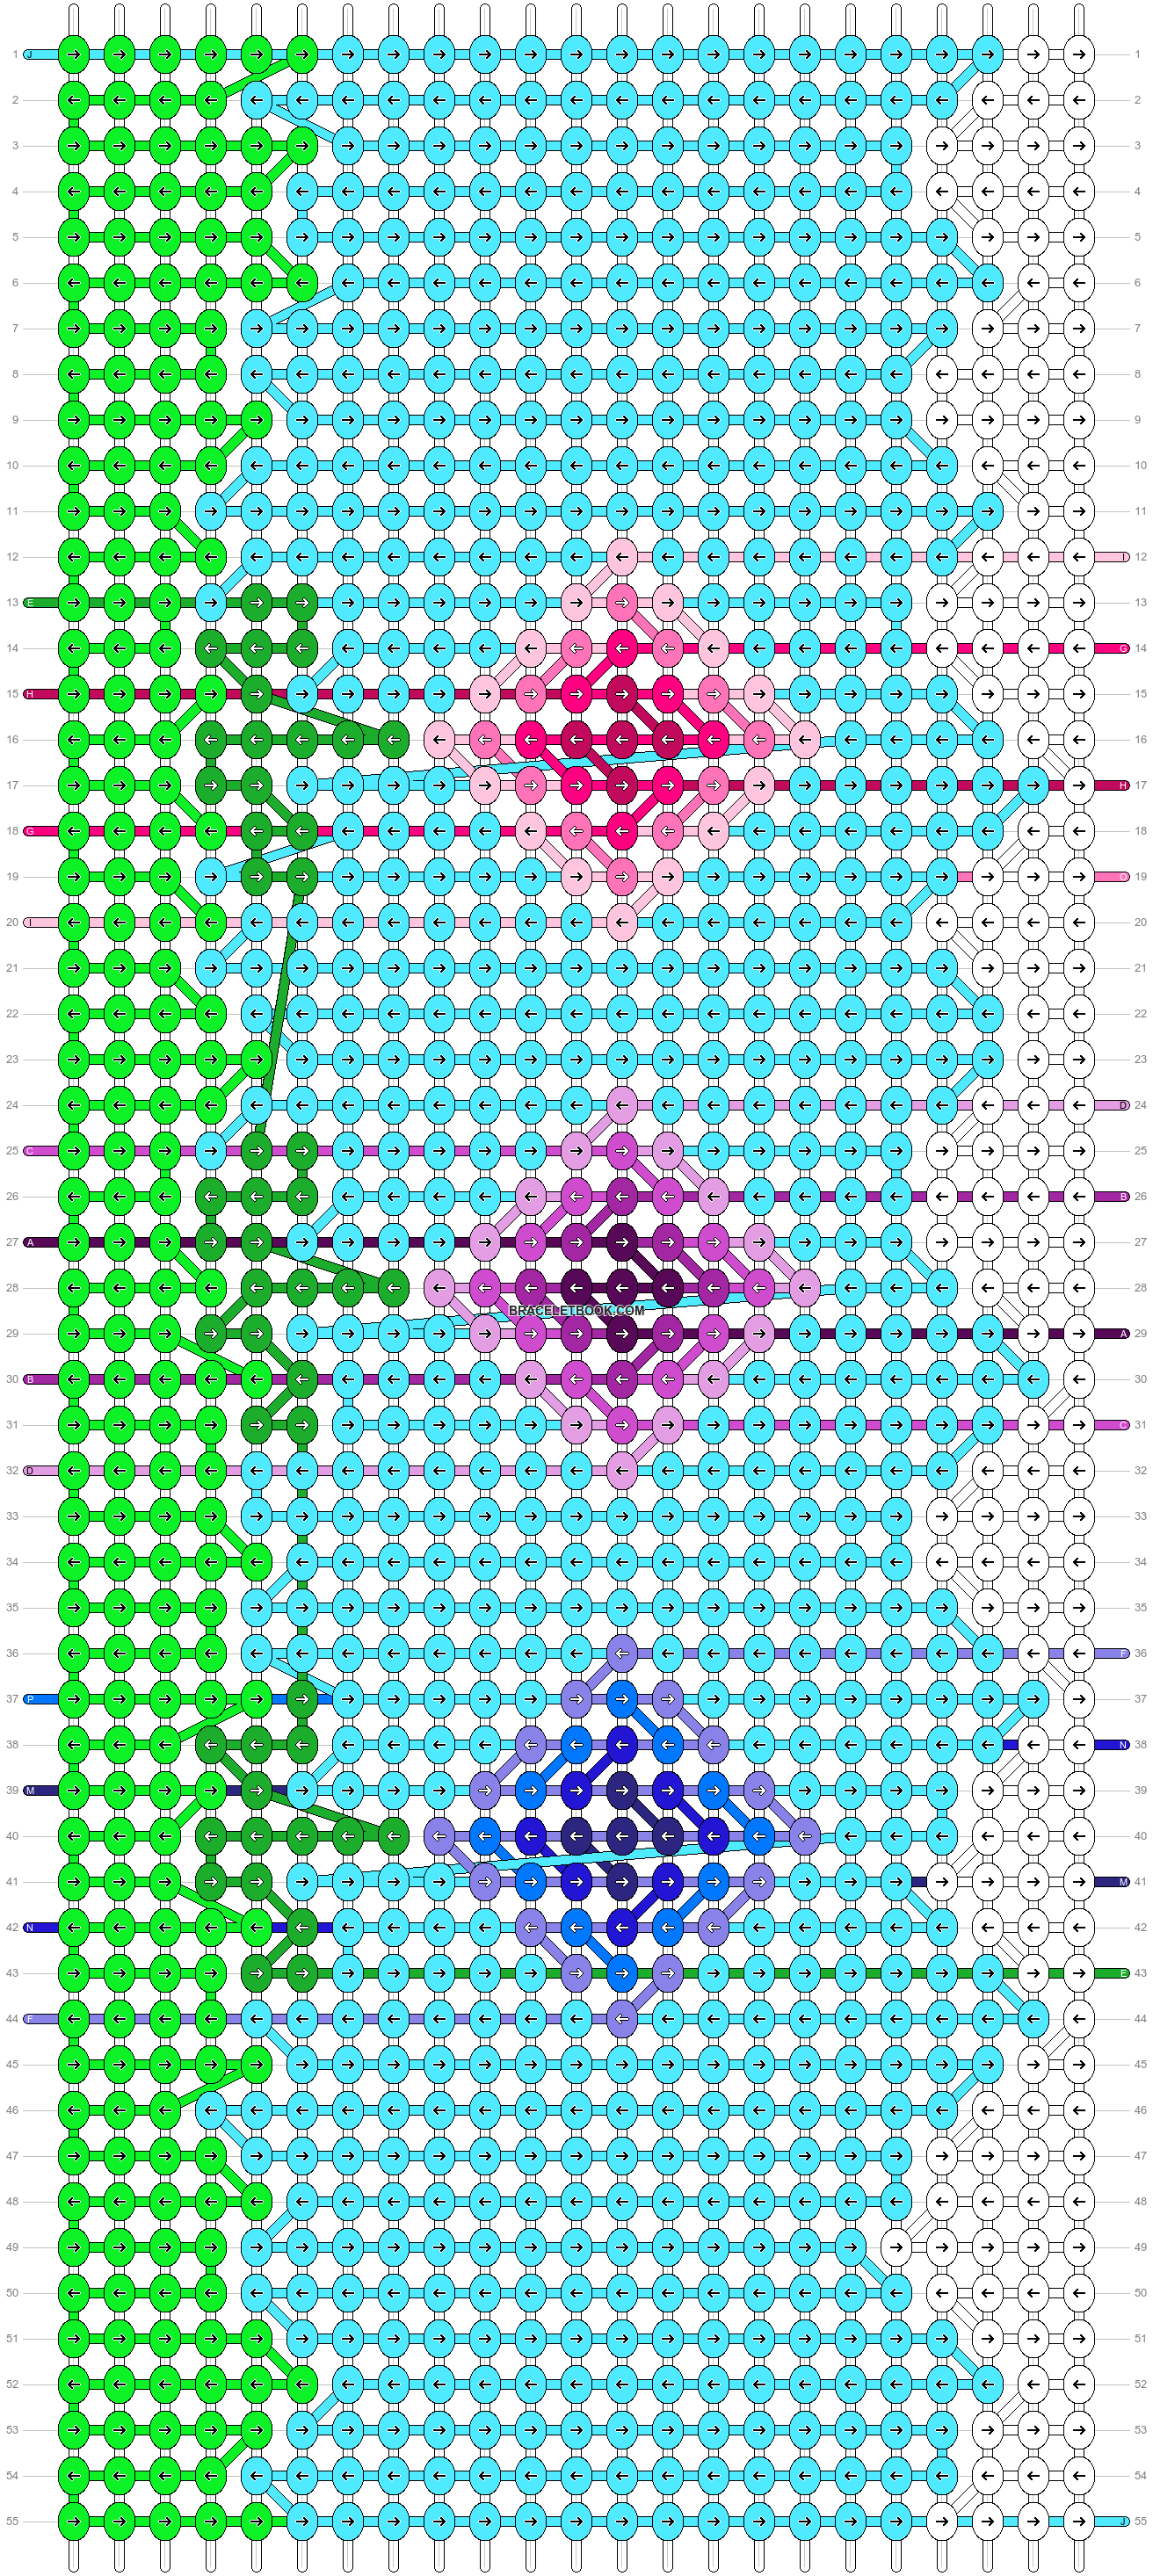 Alpha pattern #90115 pattern